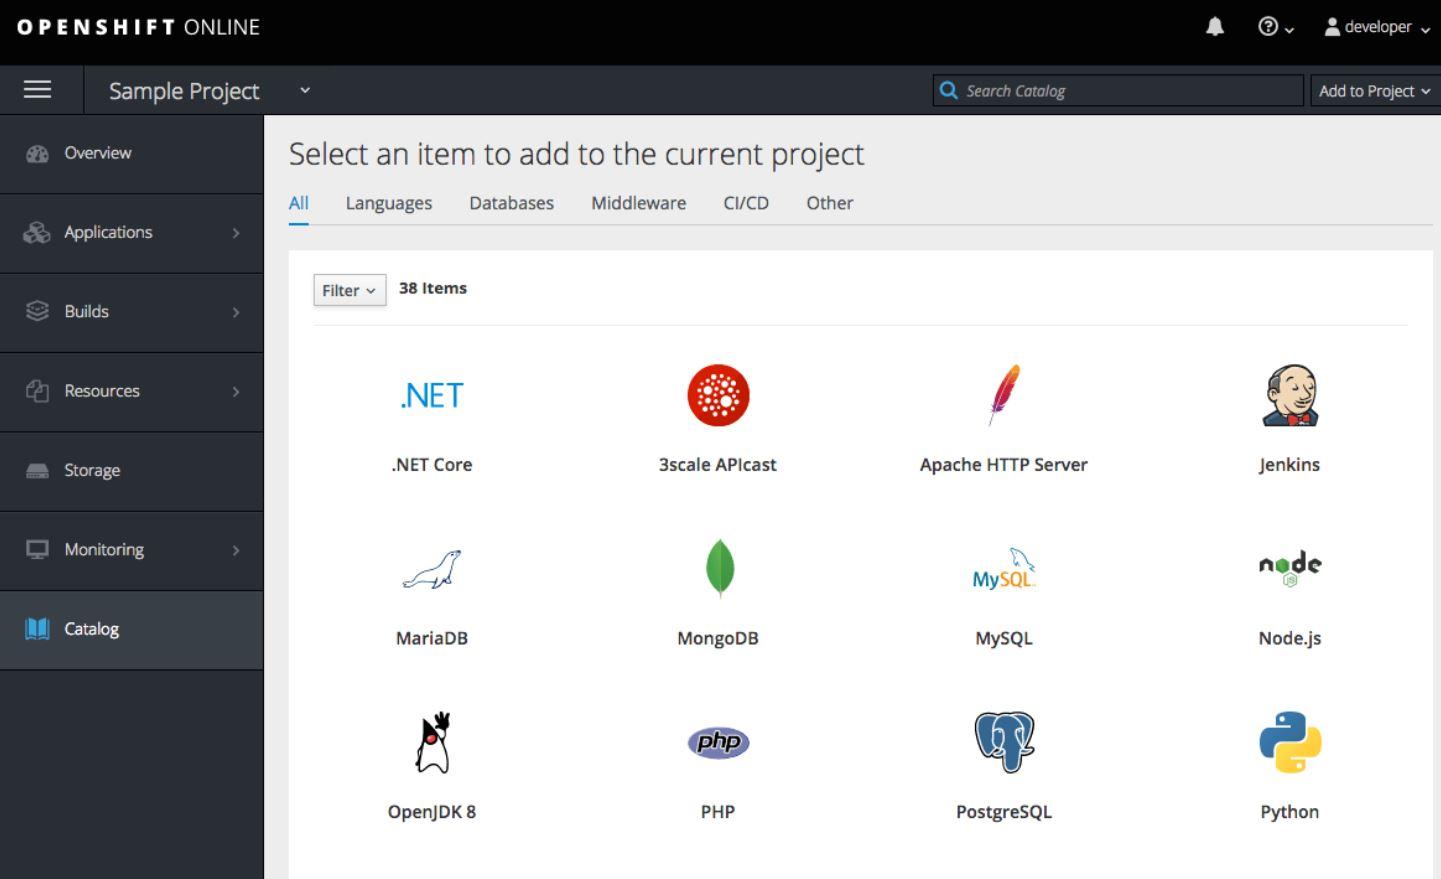 OpenShift catalog